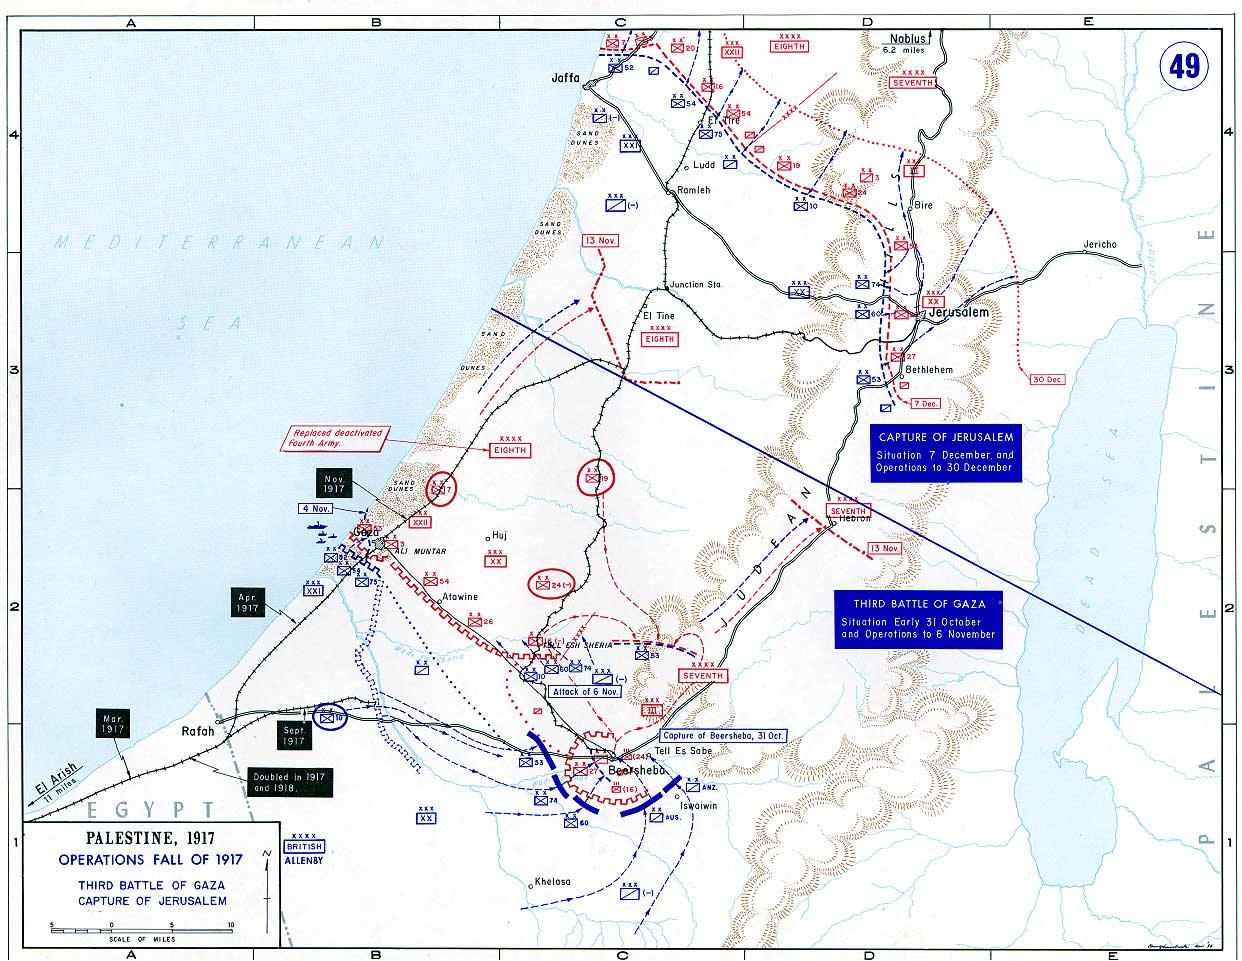 49 palestine the battle of gaza and the capture of jerusalem